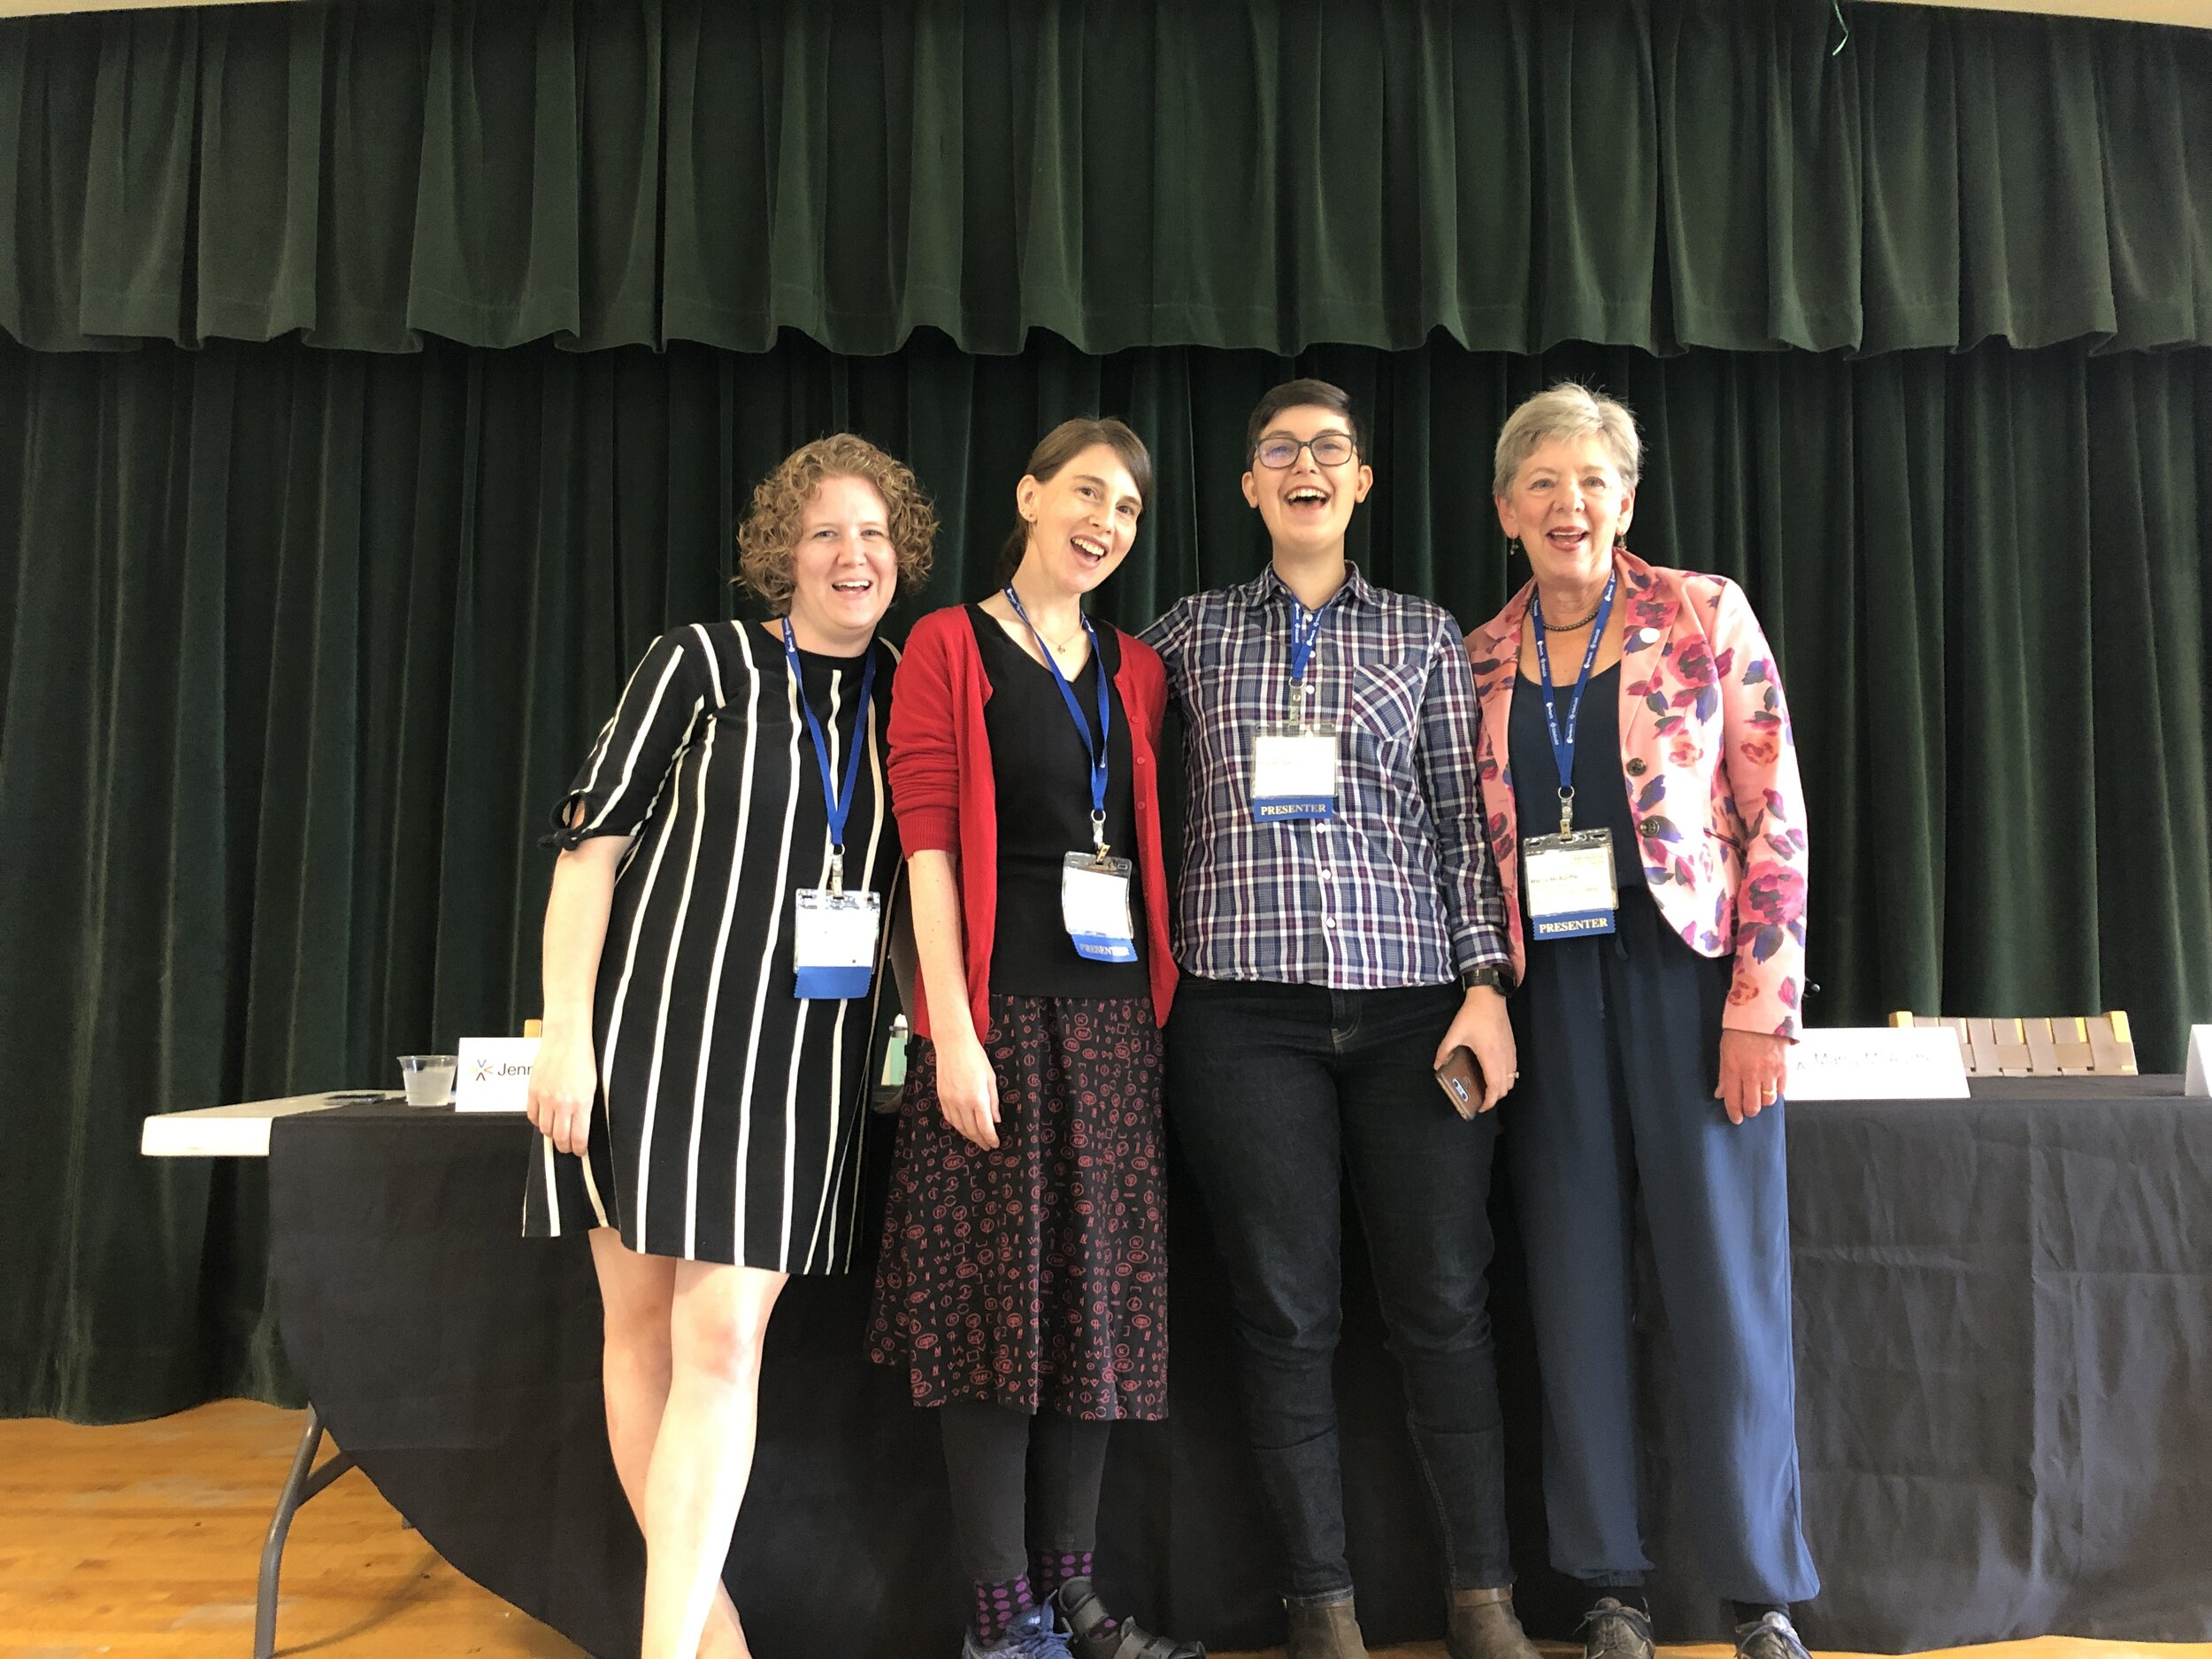 Technical Editors Kristen Legg, Jen Koogler,Hannah Garrison, and Marcy McAuliffe before their panel Photo Credit: Hannah Garrison